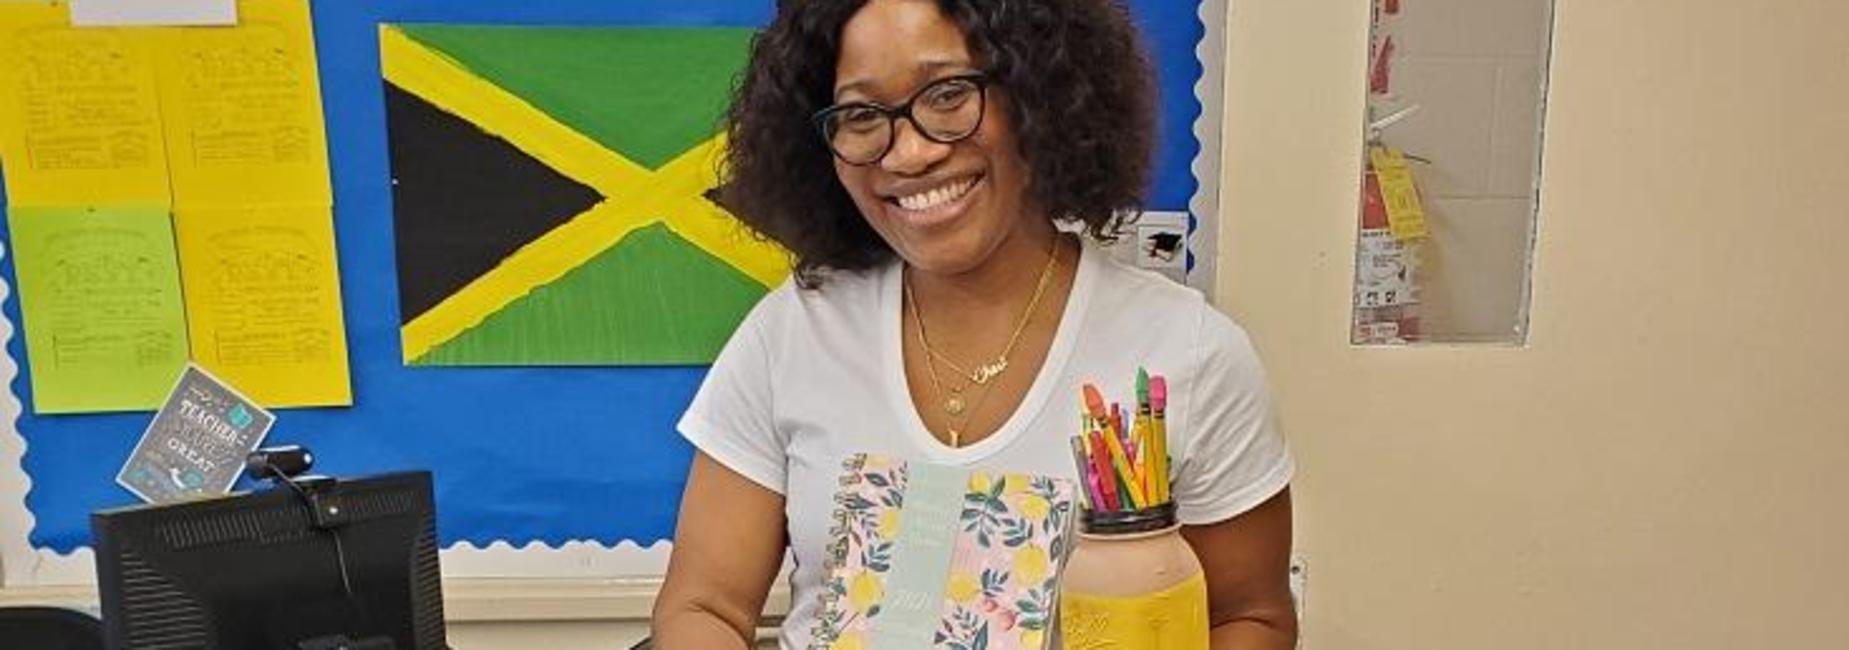 Teacher Appreciation Daily Winner - Ms. Hutchinson